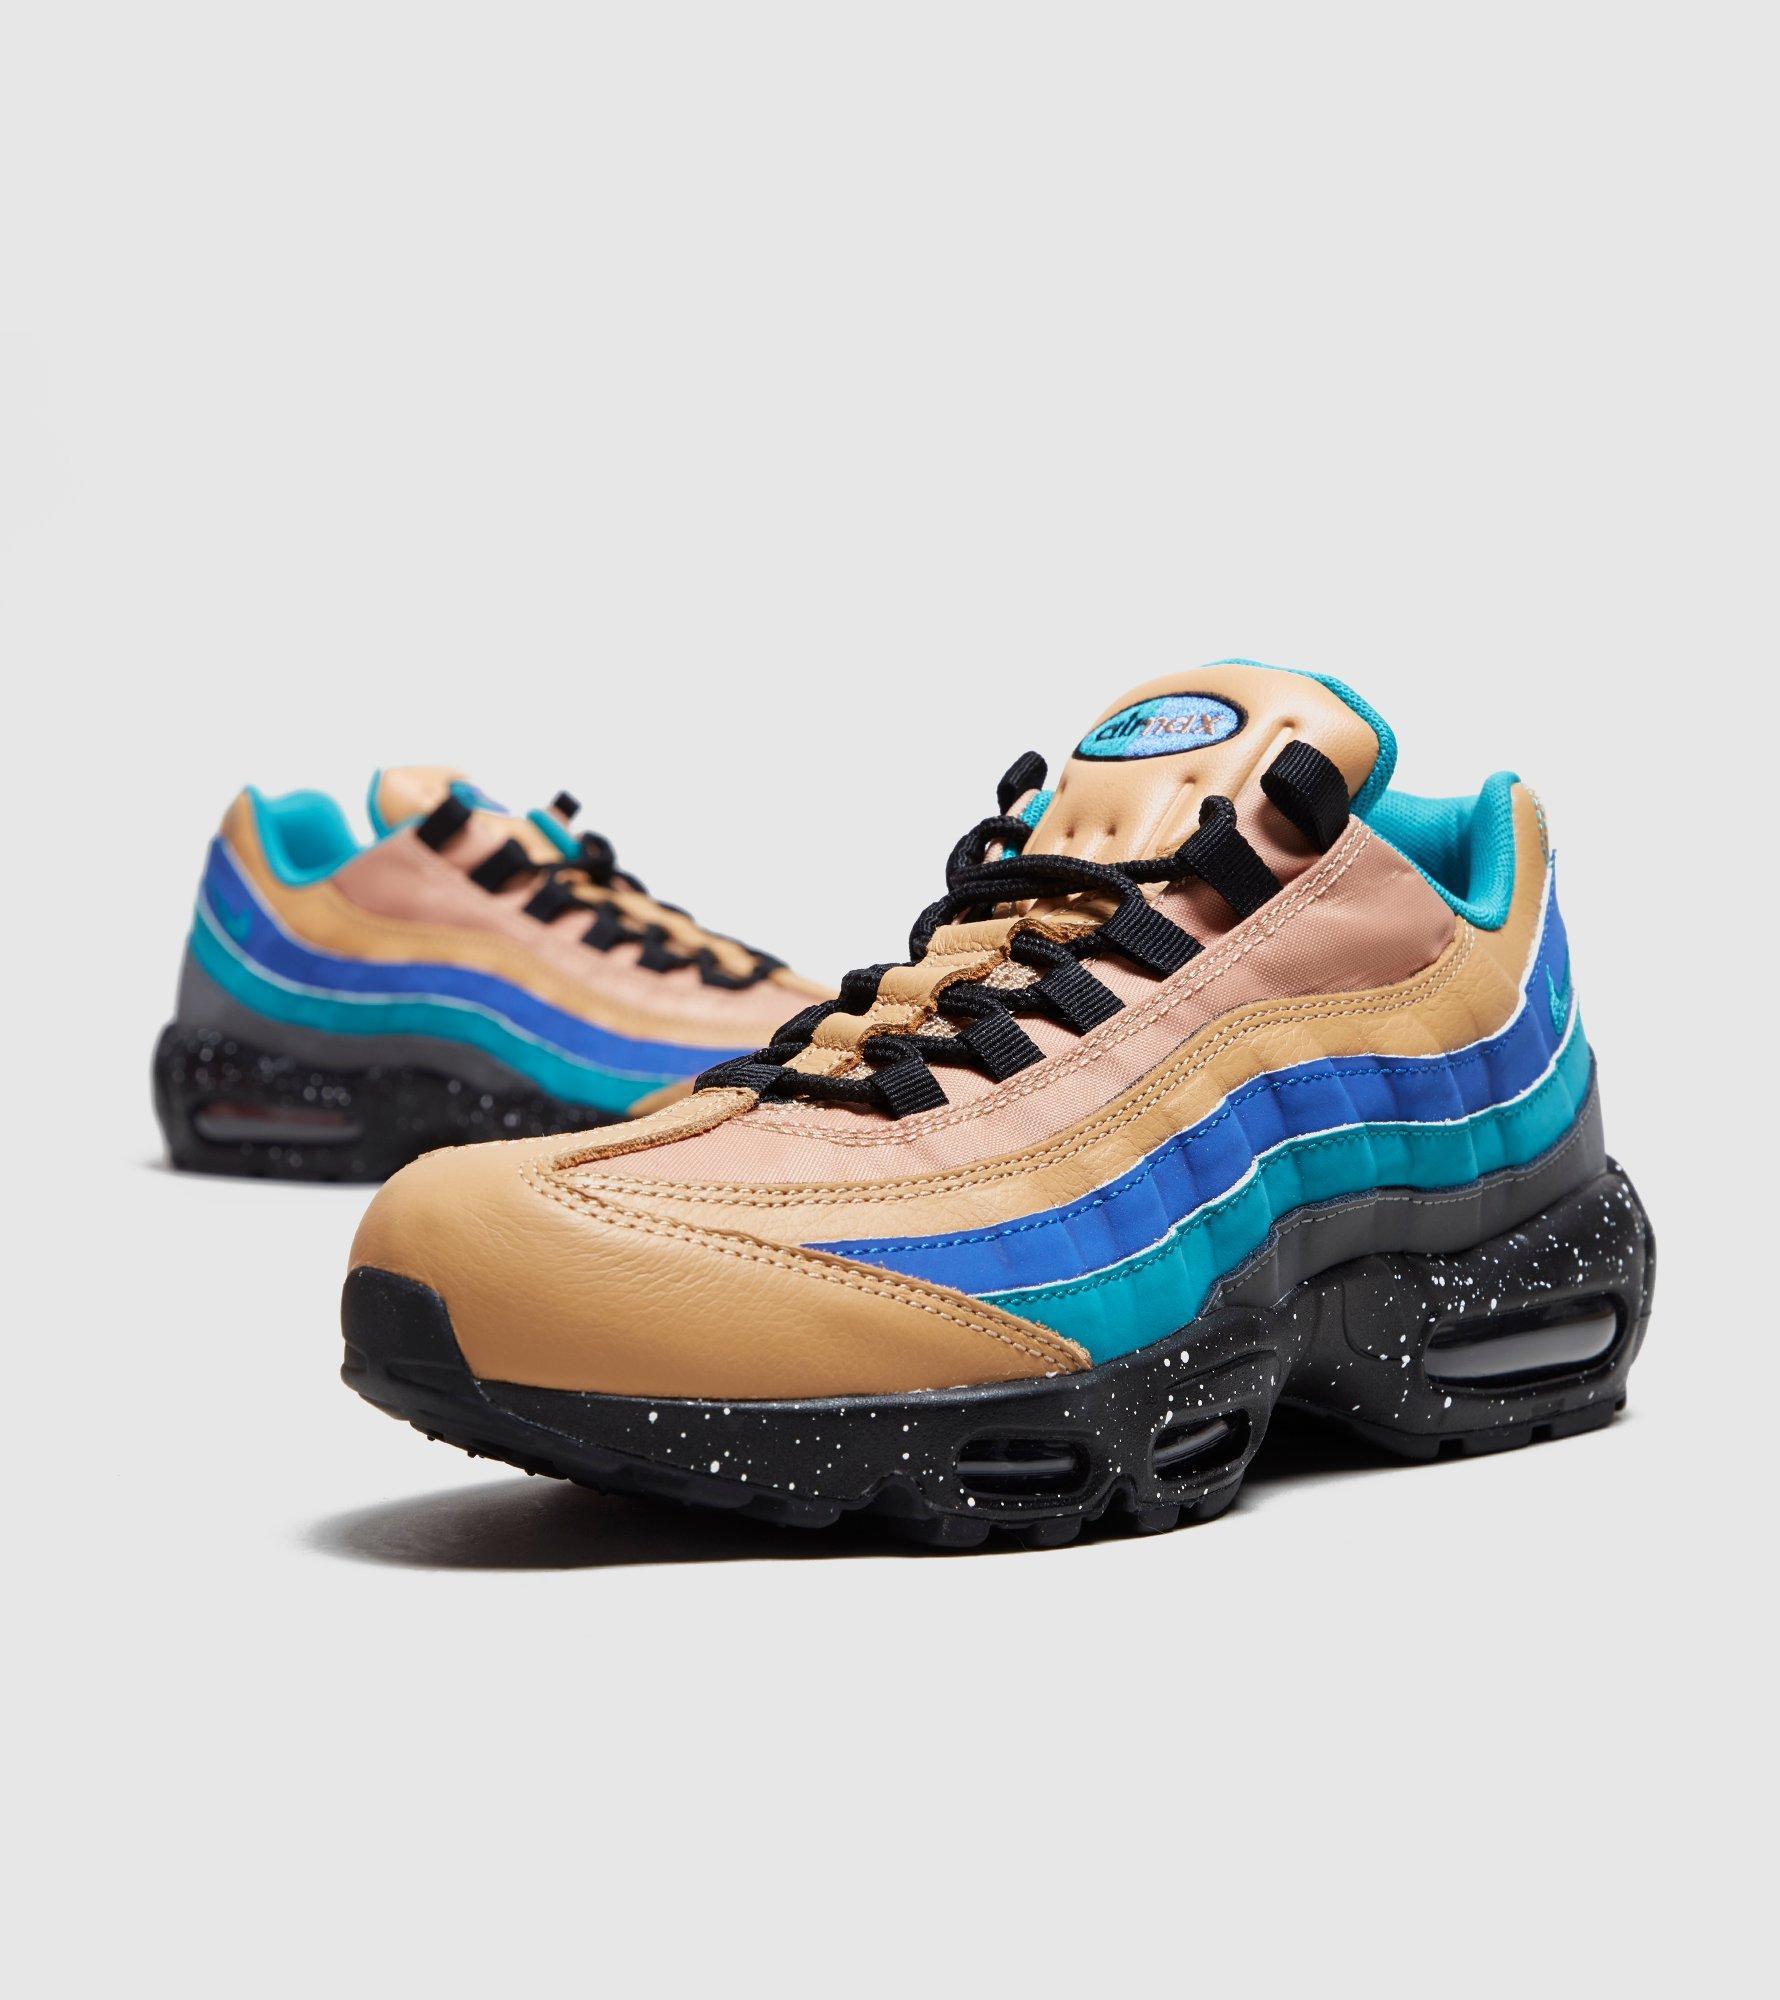 Tan Nike Shoes Air Max